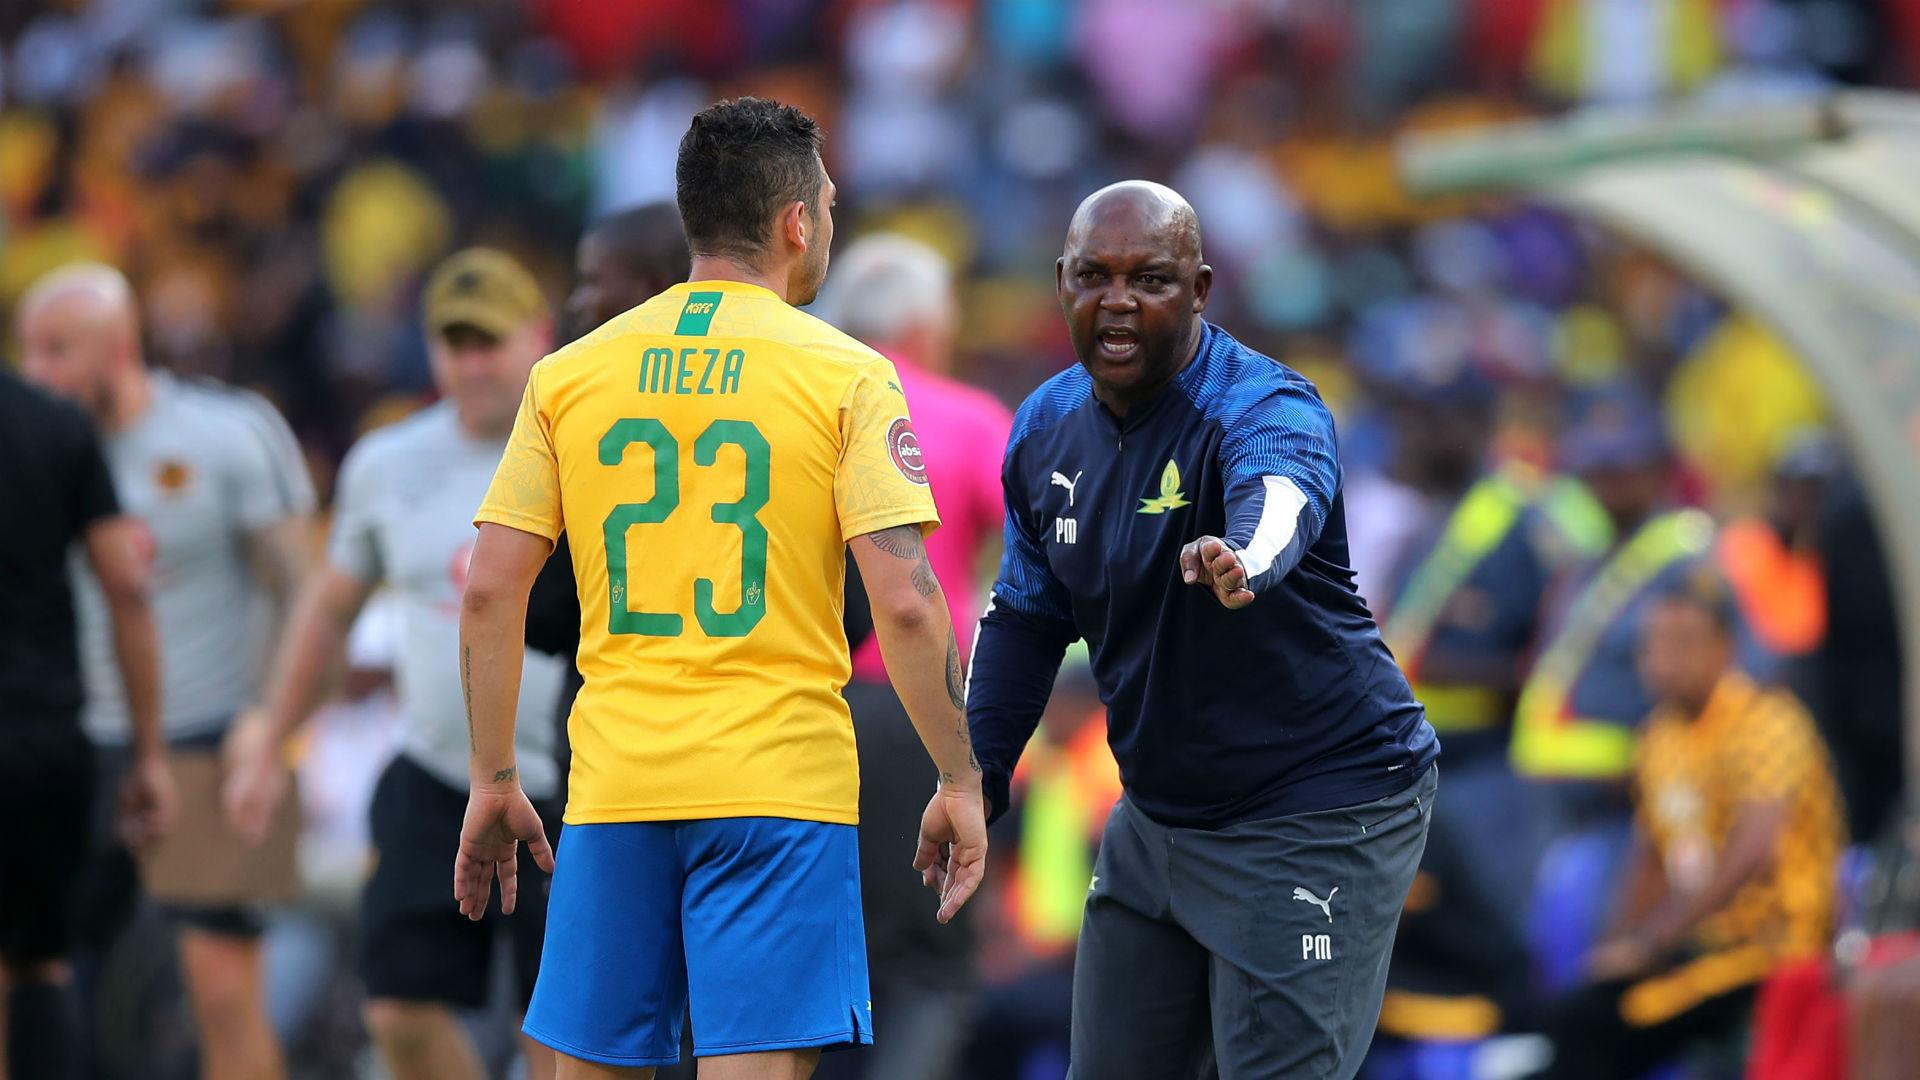 Ngcongca: Mamelodi Sundowns coach Mosimane is at the same level with Belgium's Vercauteren